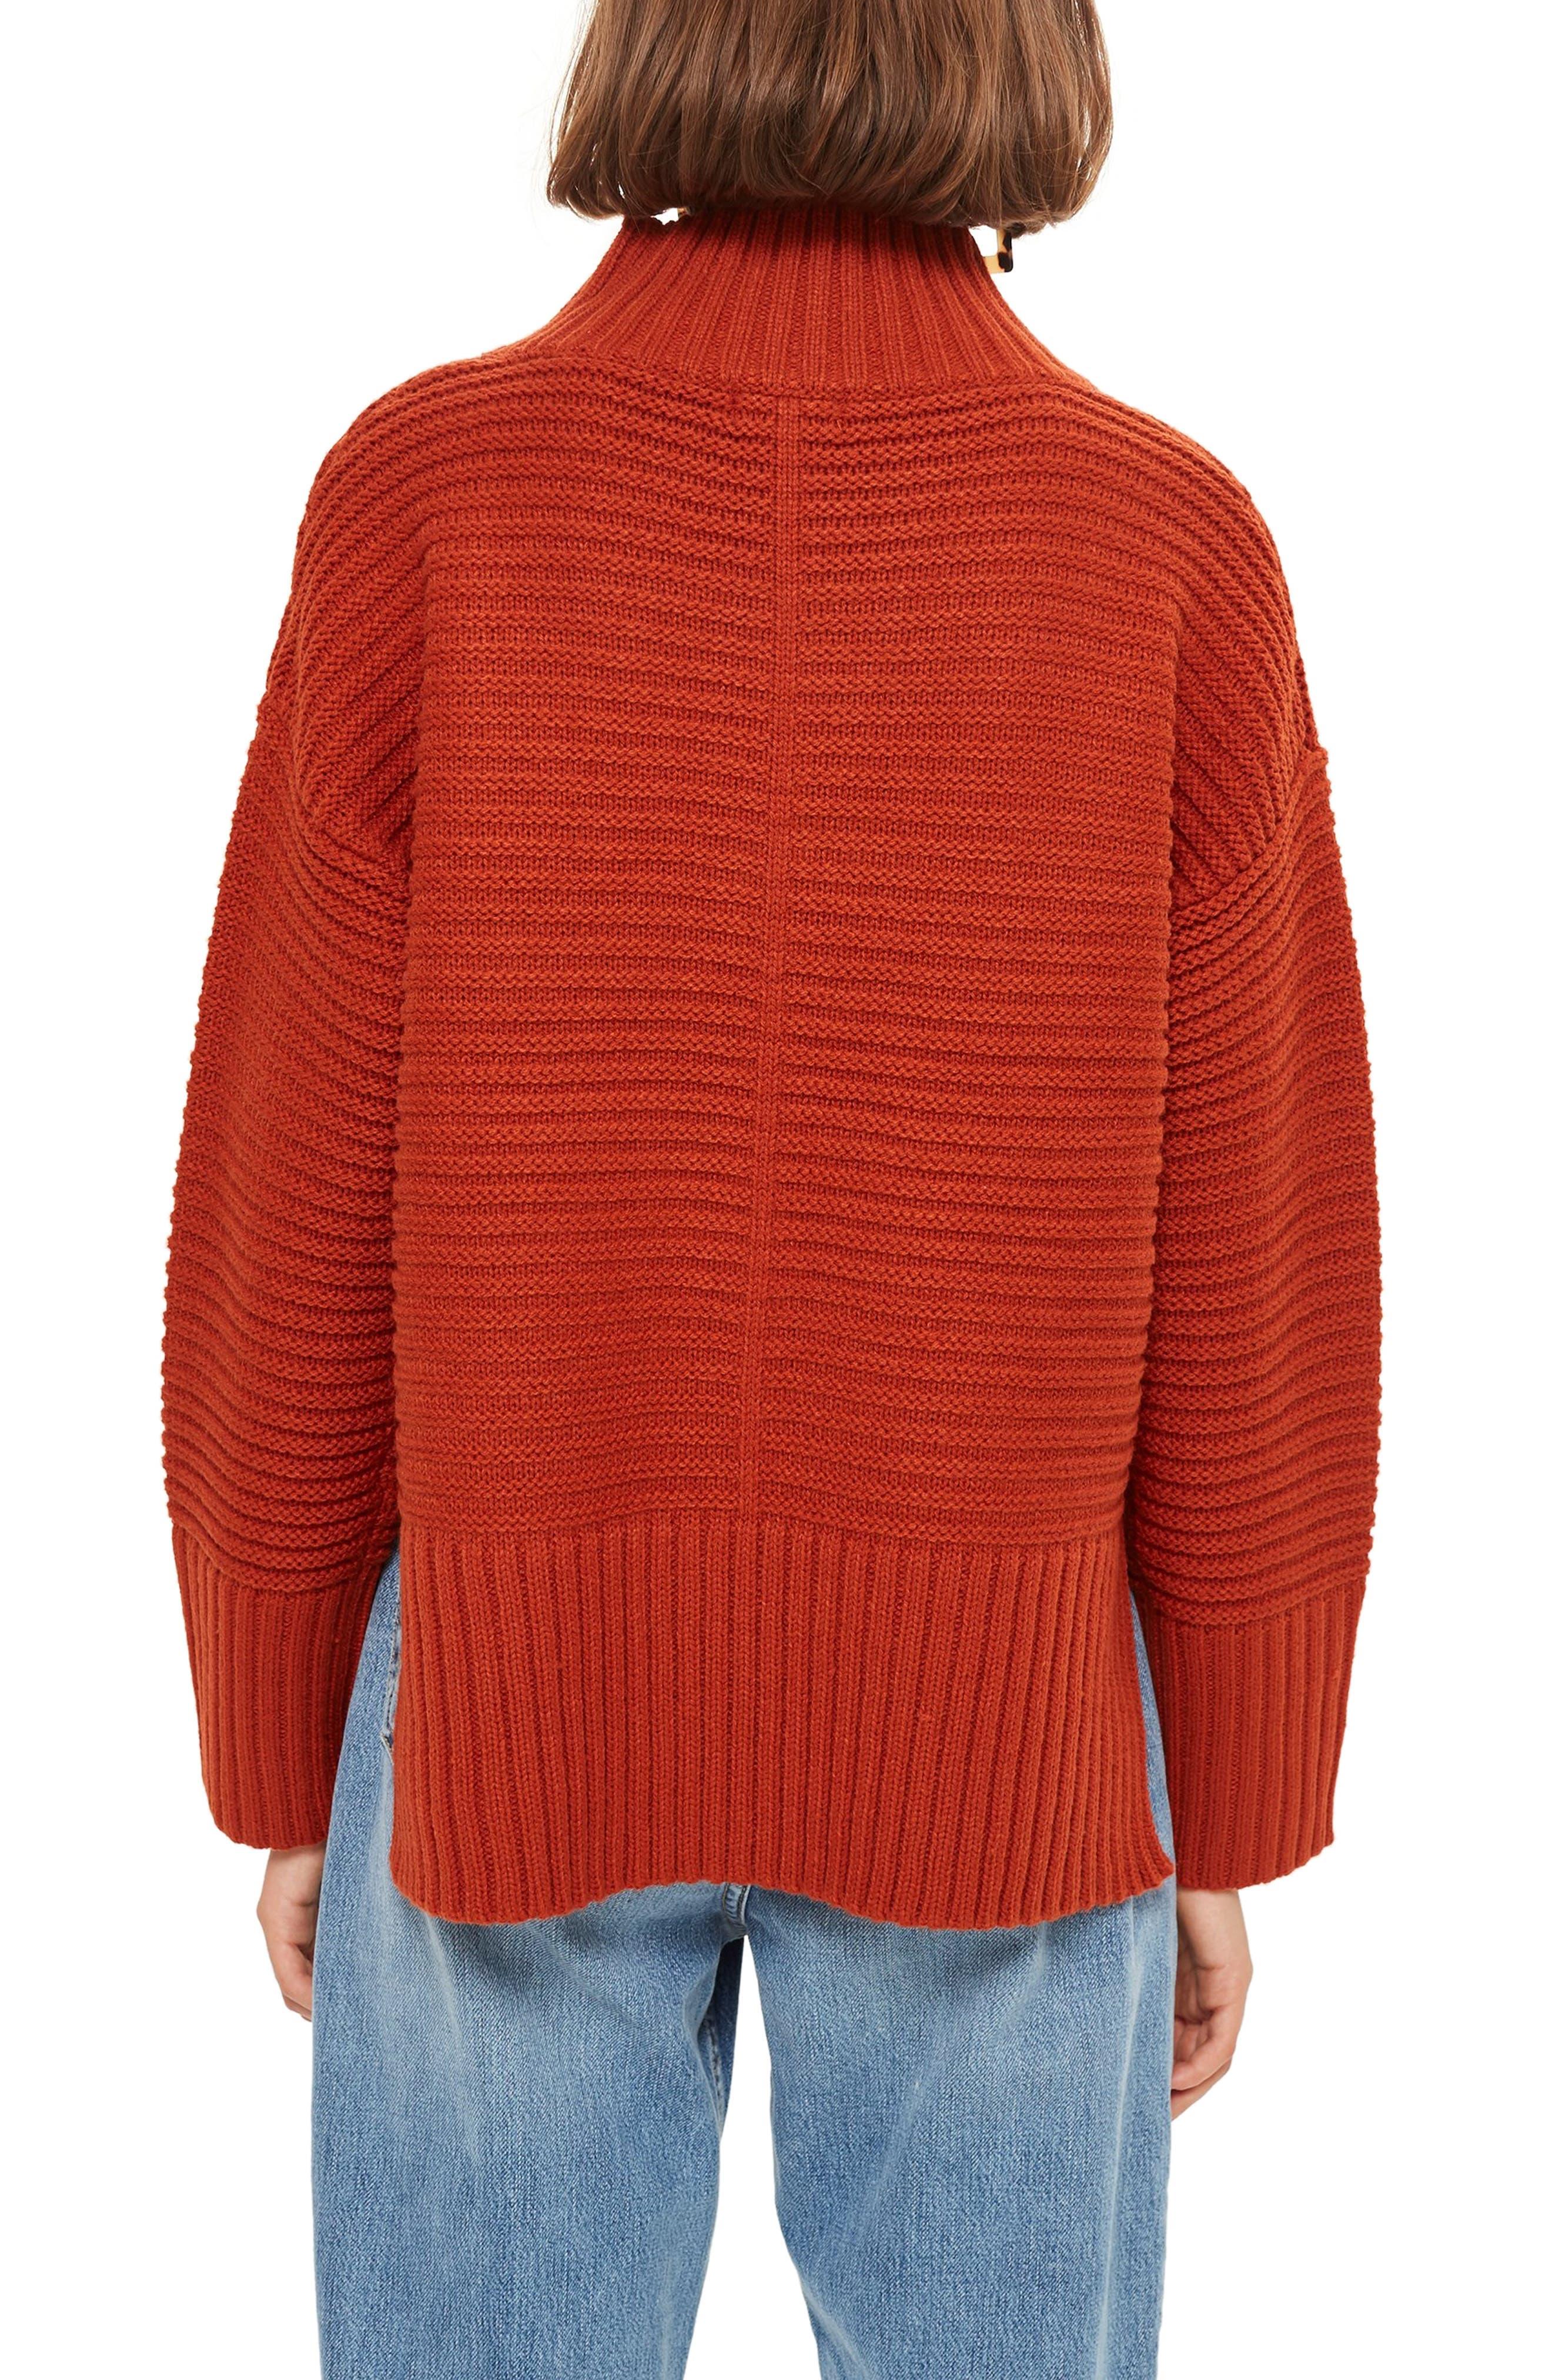 TOPSHOP, Mock Neck Sweater, Alternate thumbnail 2, color, RUST